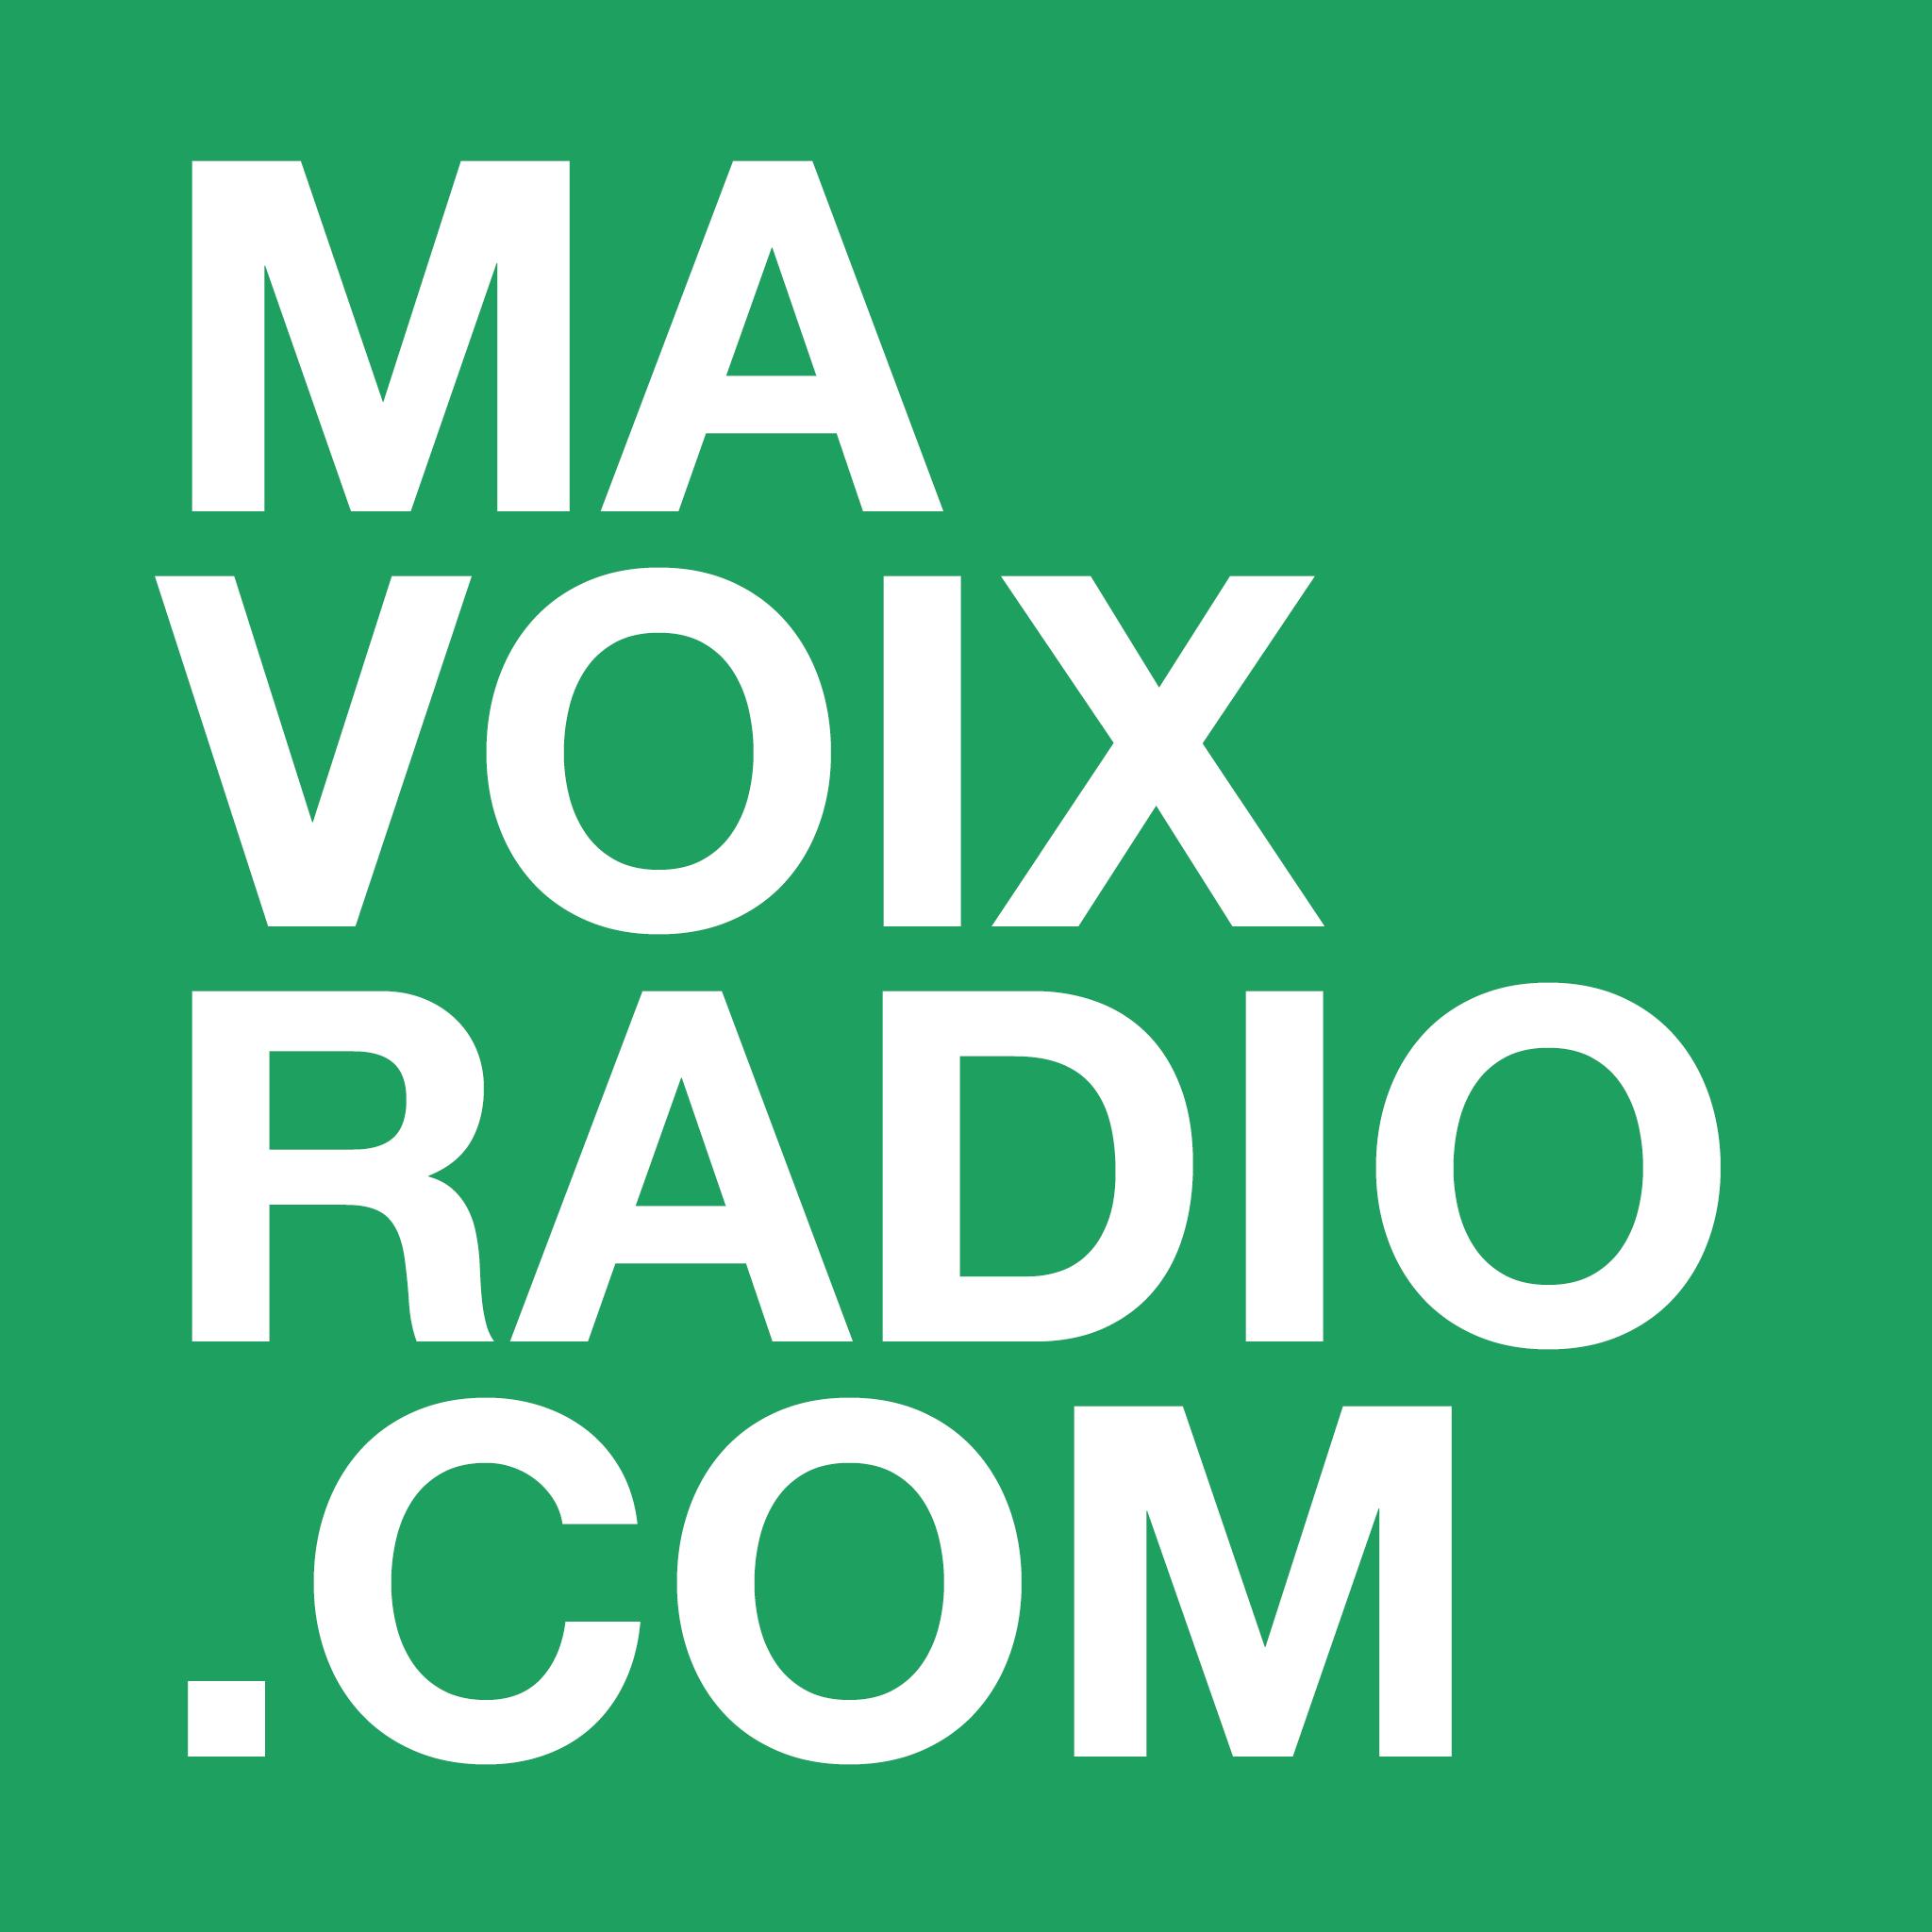 MaVoixRadio.com